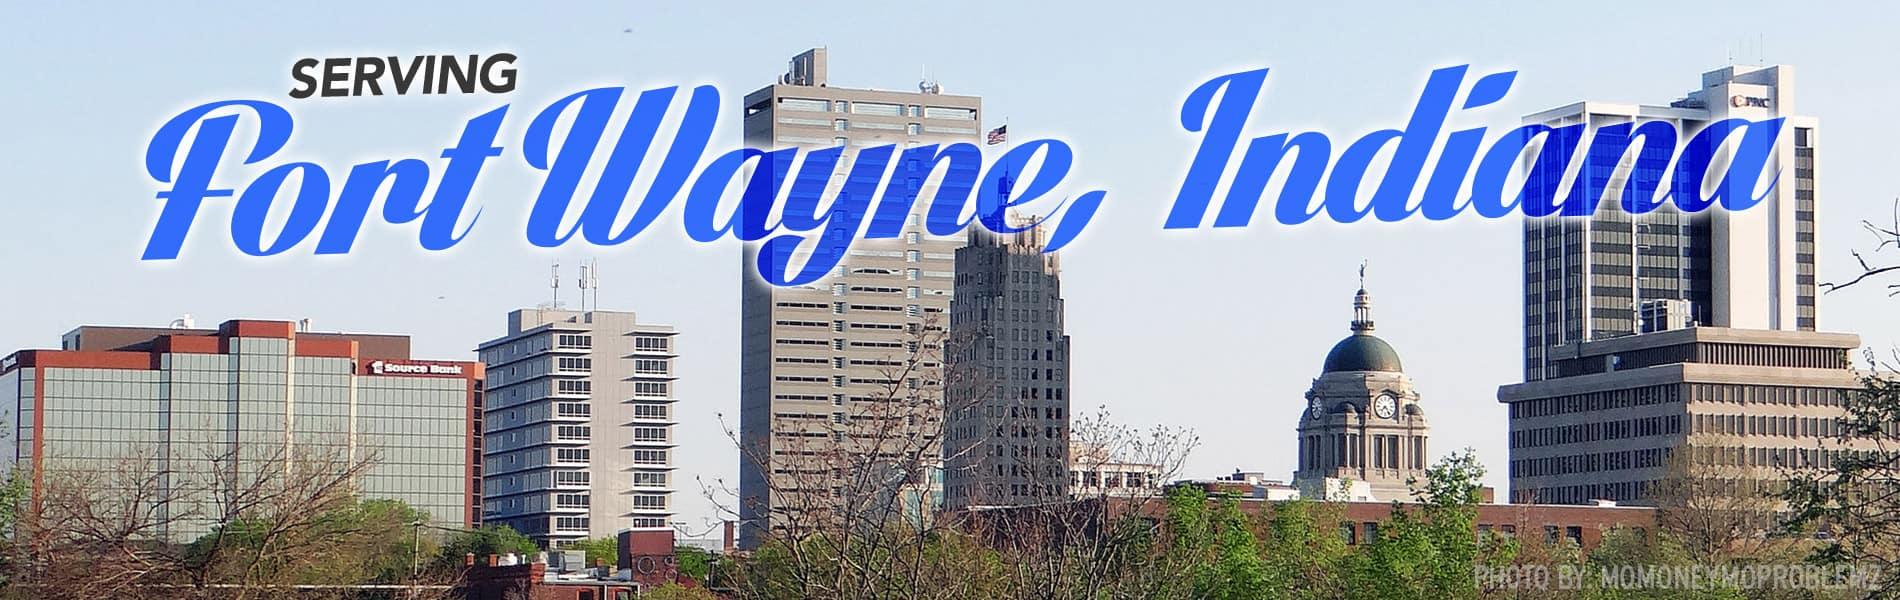 Serving Fort Wayne, IN